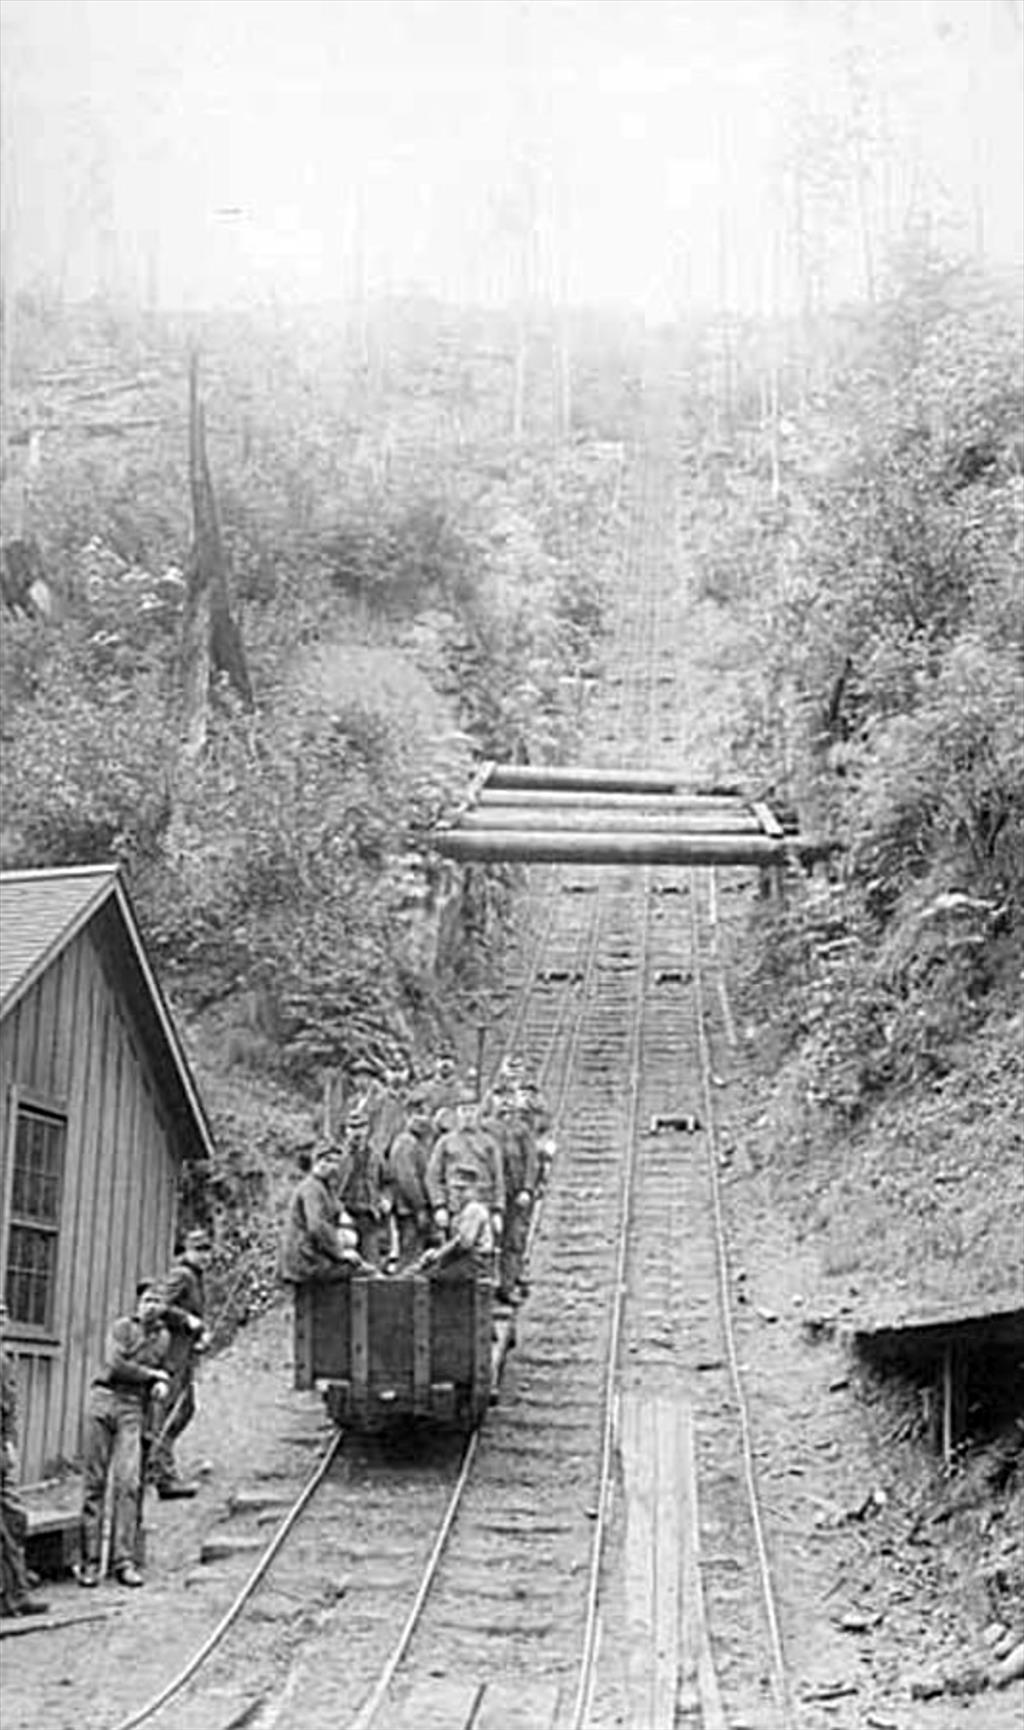 miners riding incline railway, carbonado, 1890s